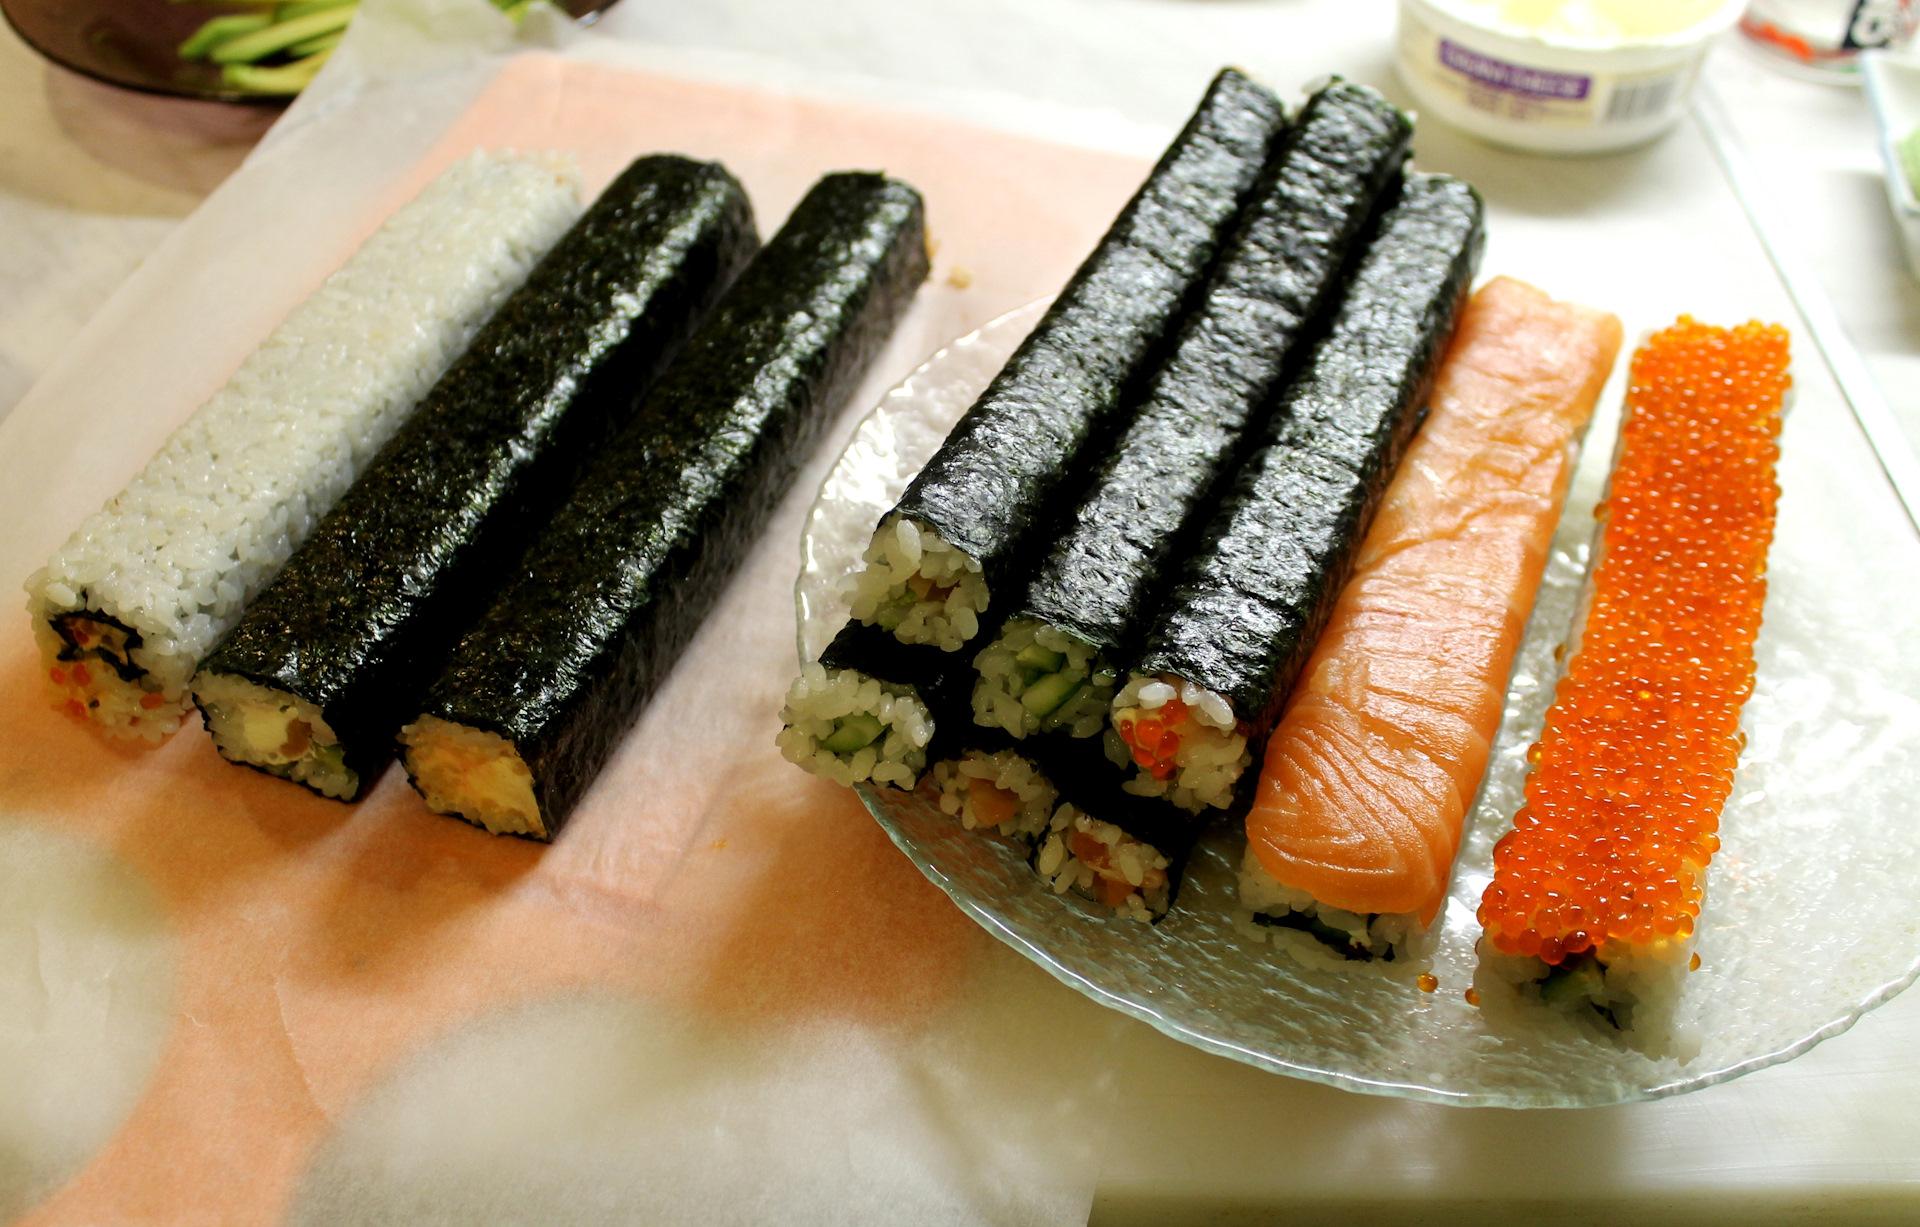 приготовить суши в домашних условиях в картинках